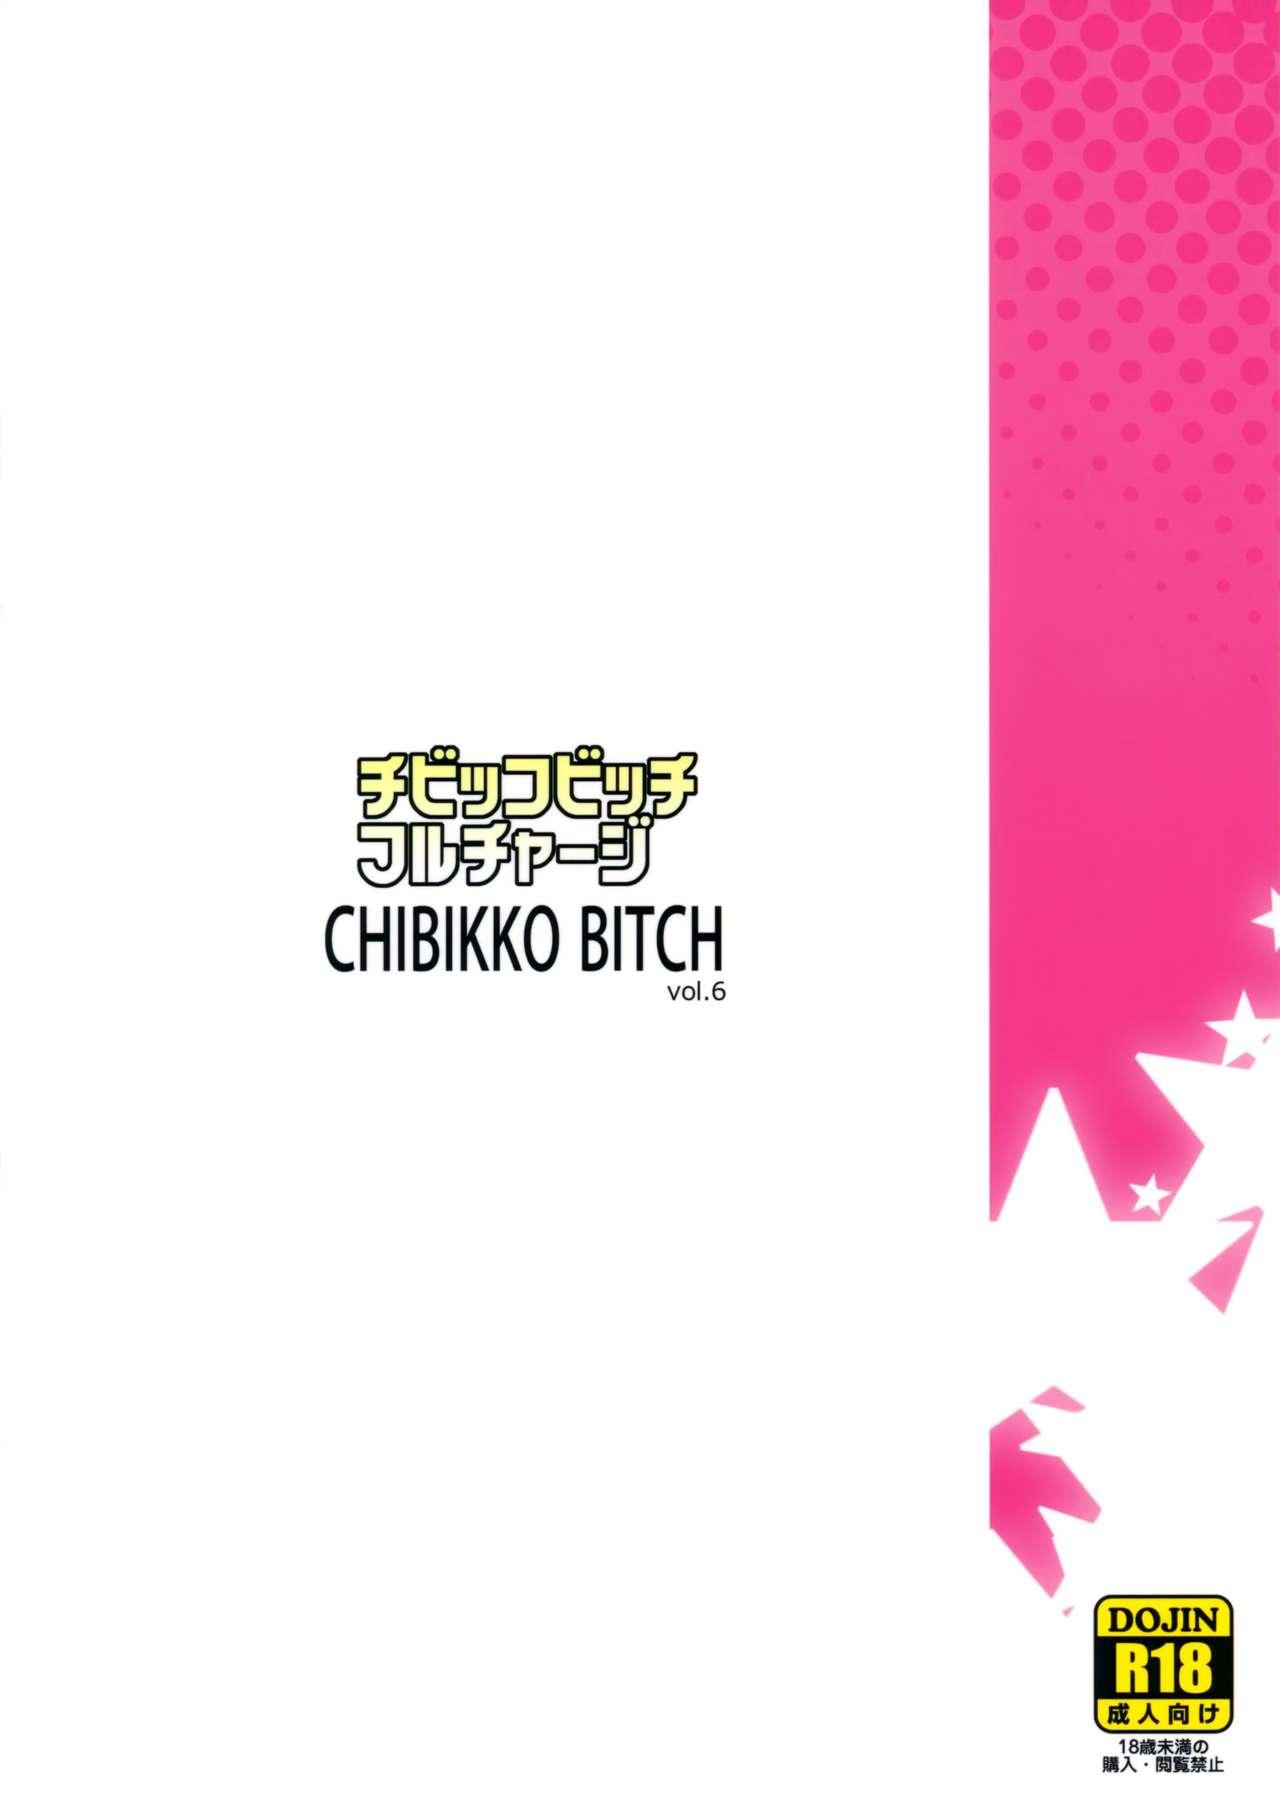 Chibikko Bitch Full charge 25